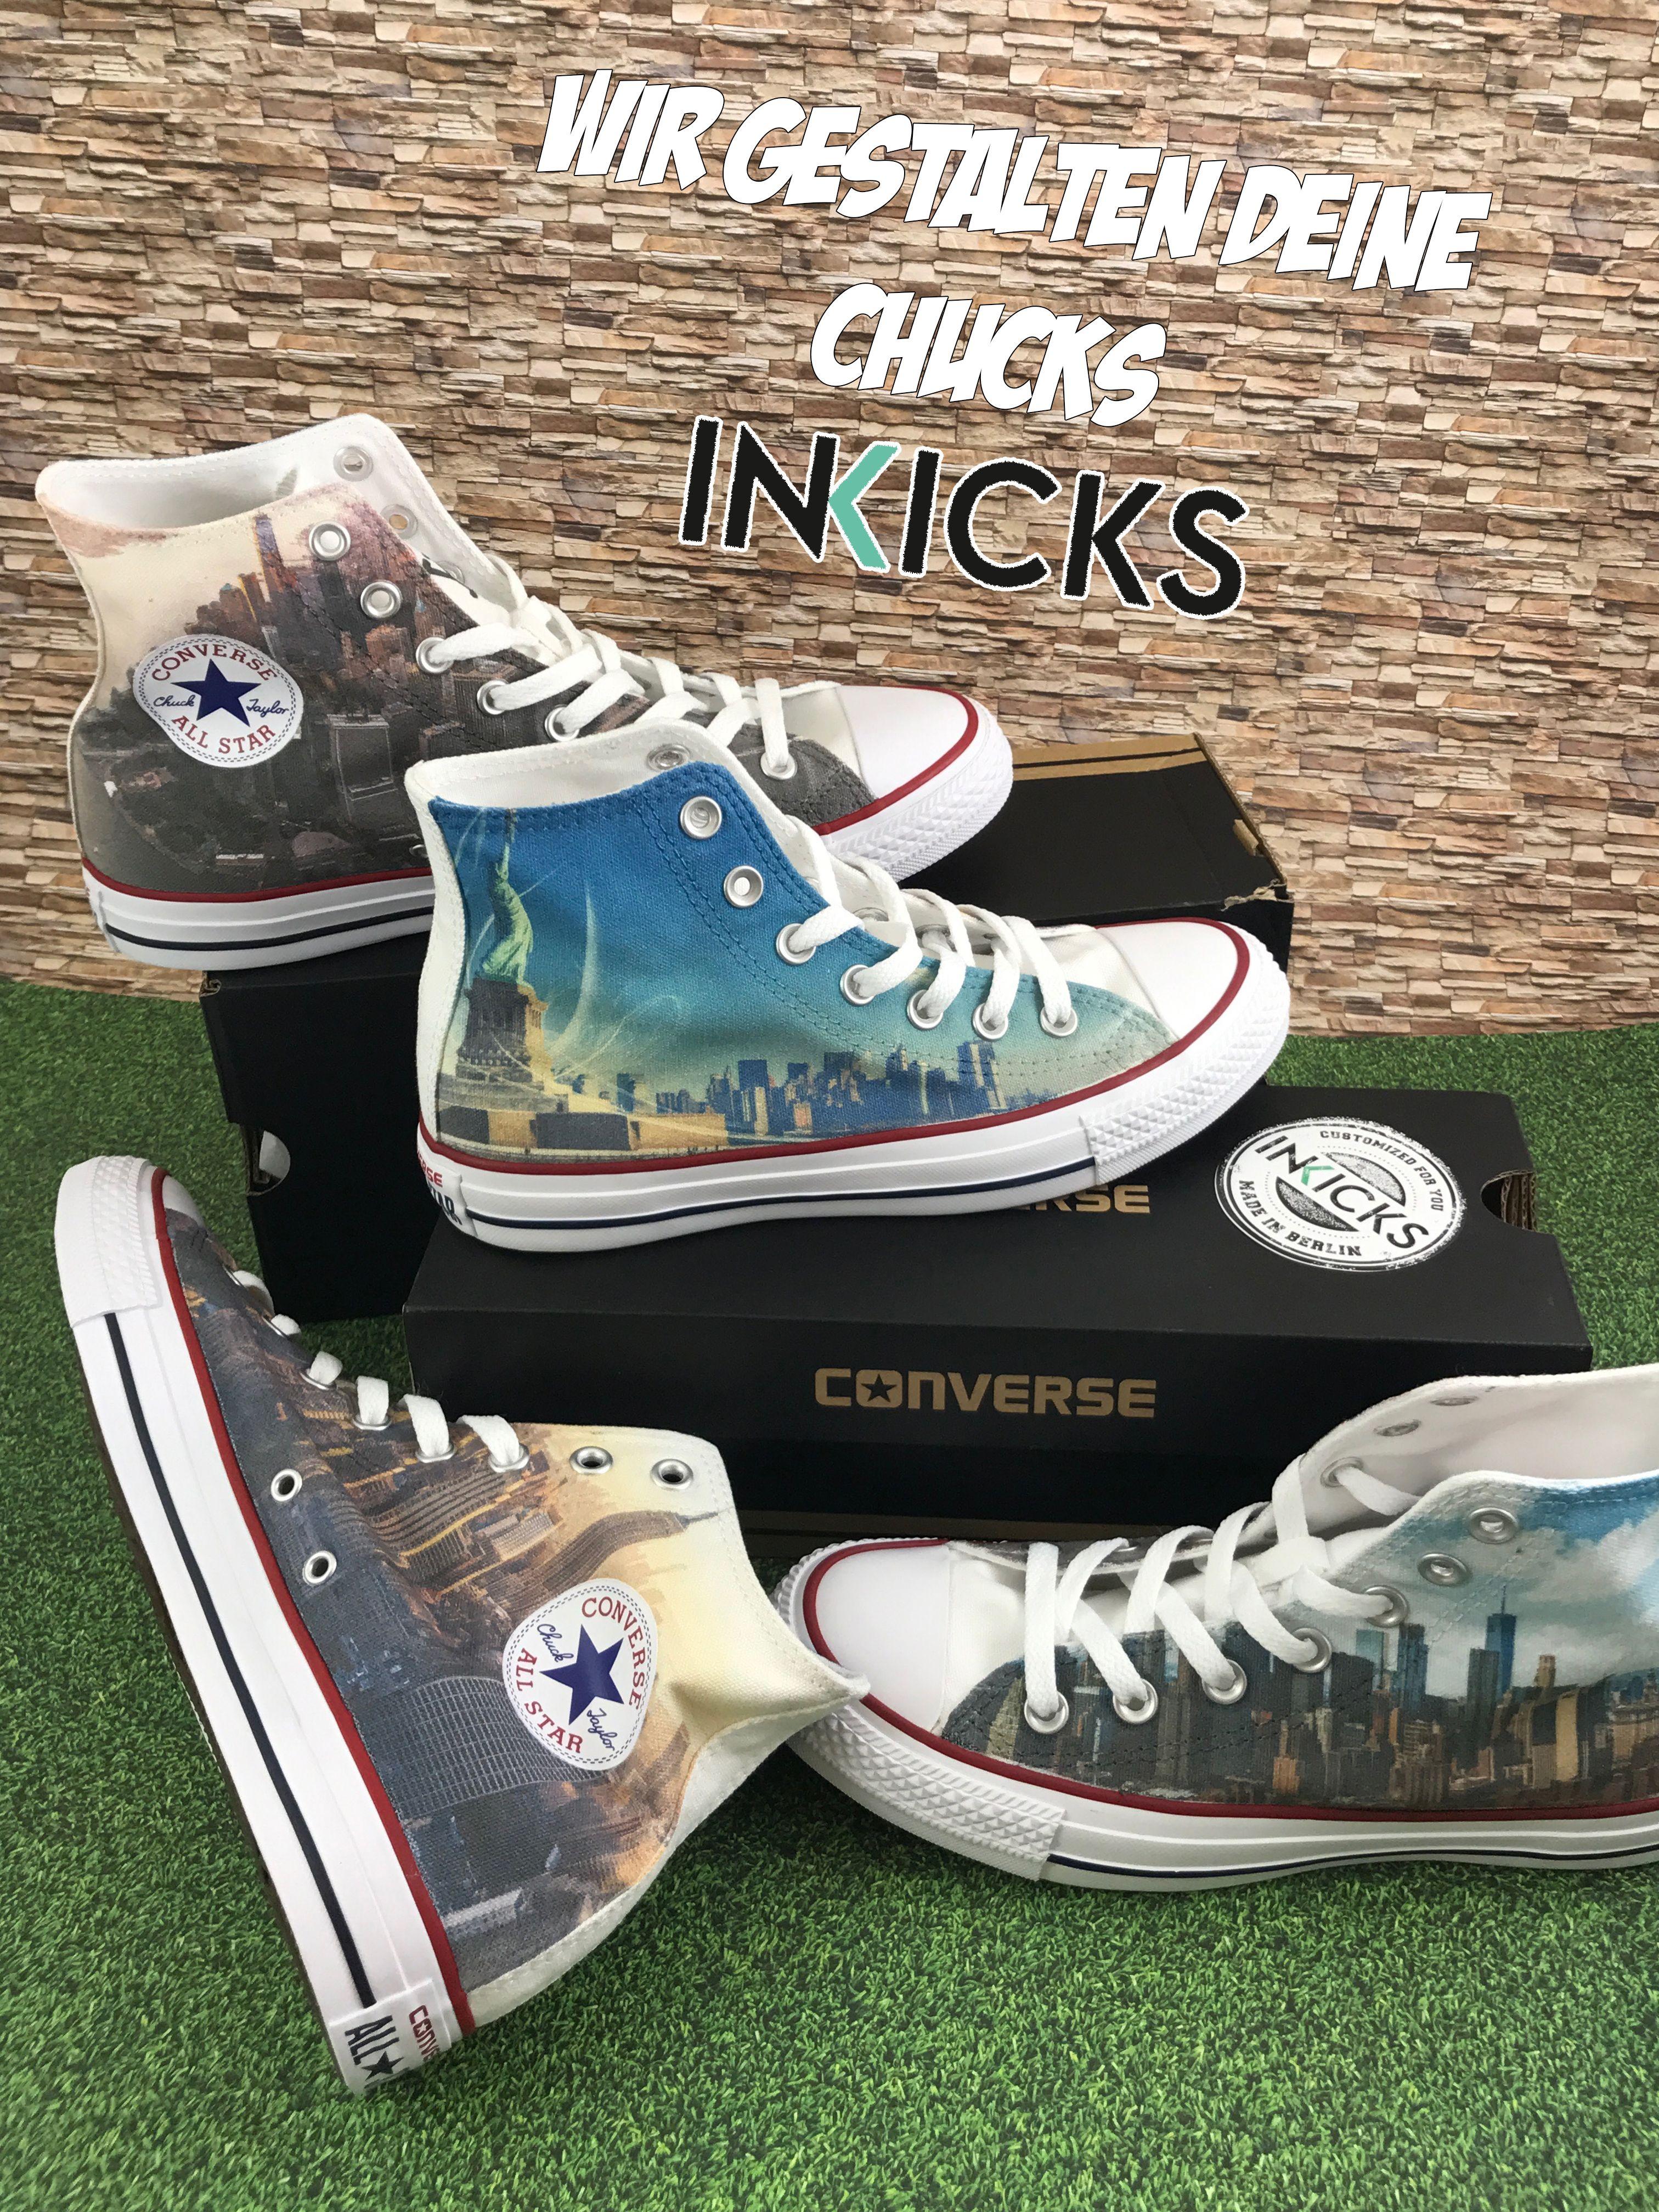 Create your own | Converse chucks, Converse, Chucks schuhe